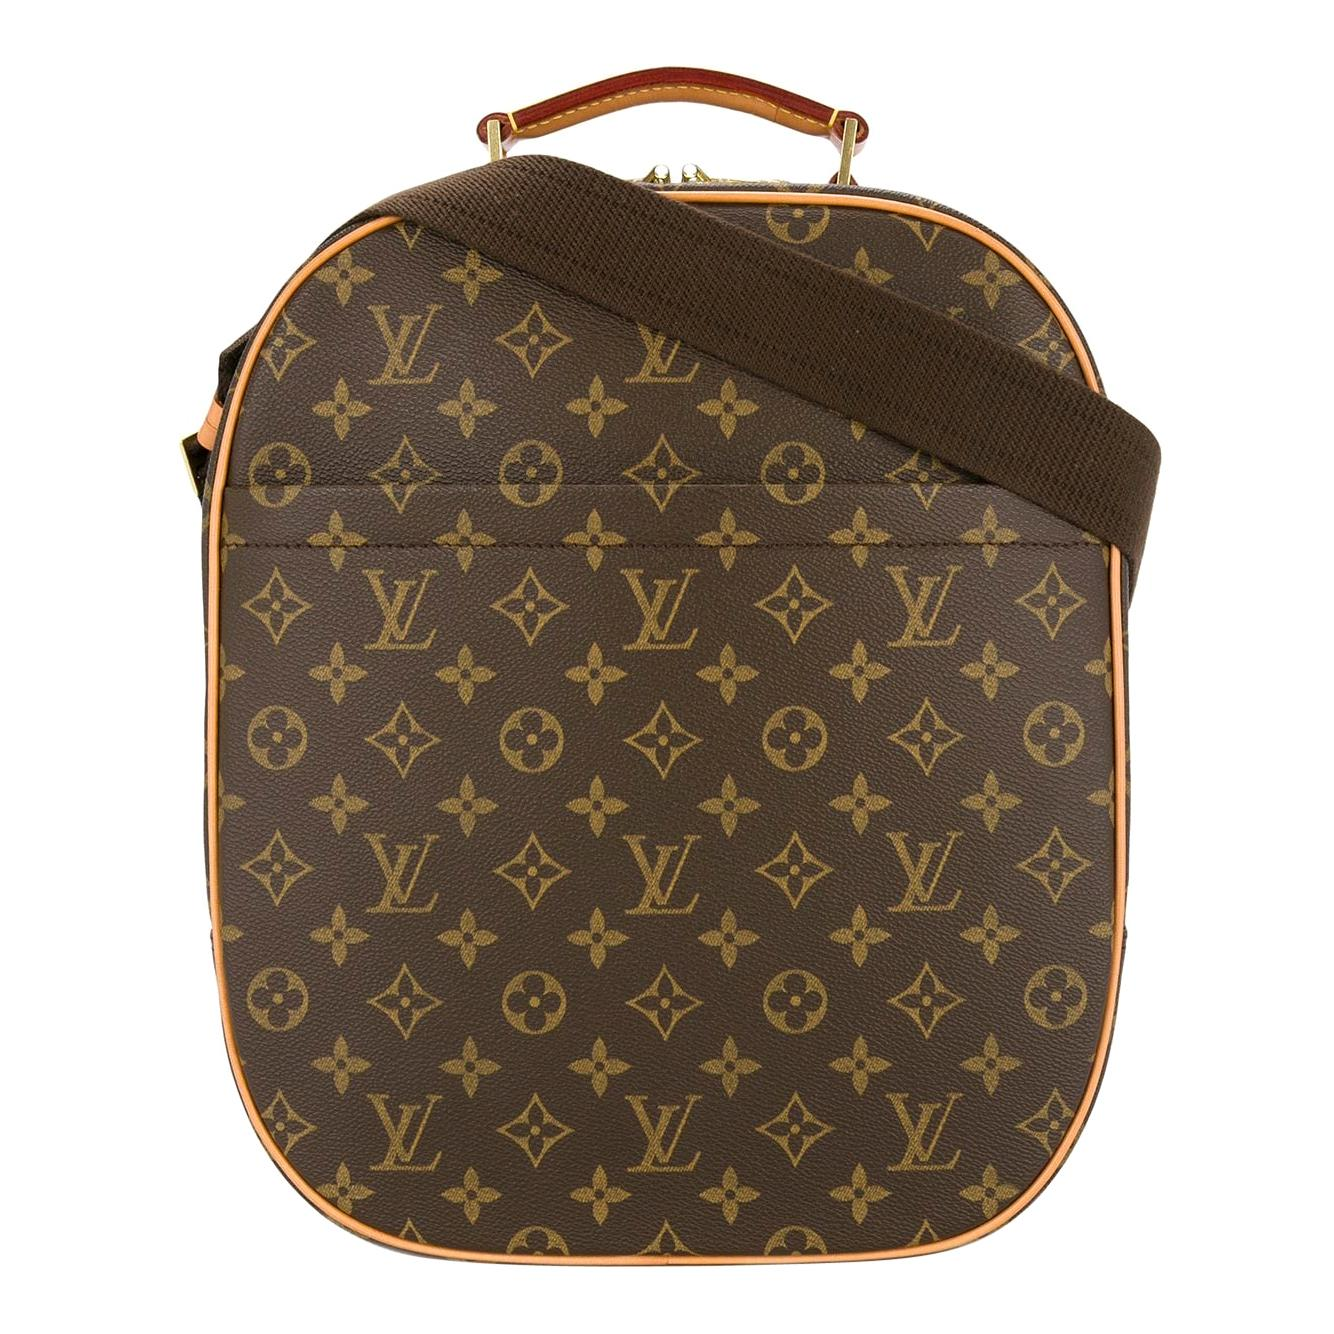 Louis Vuitton Monogram Men's Women's Carryall Travel One Shoulder Backpack Bag